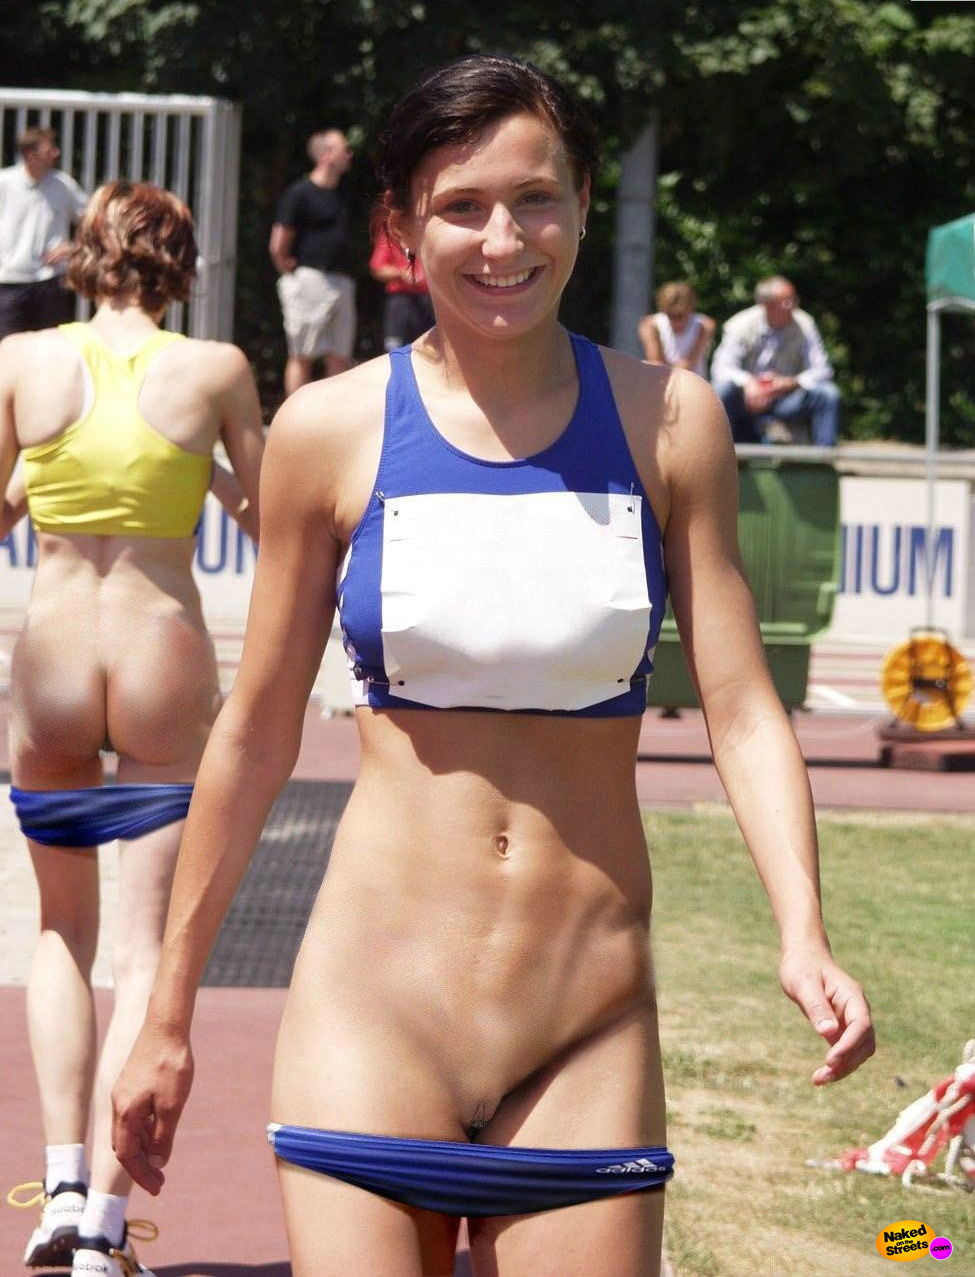 malfunction sport olympic wardrobe Accidental nudity